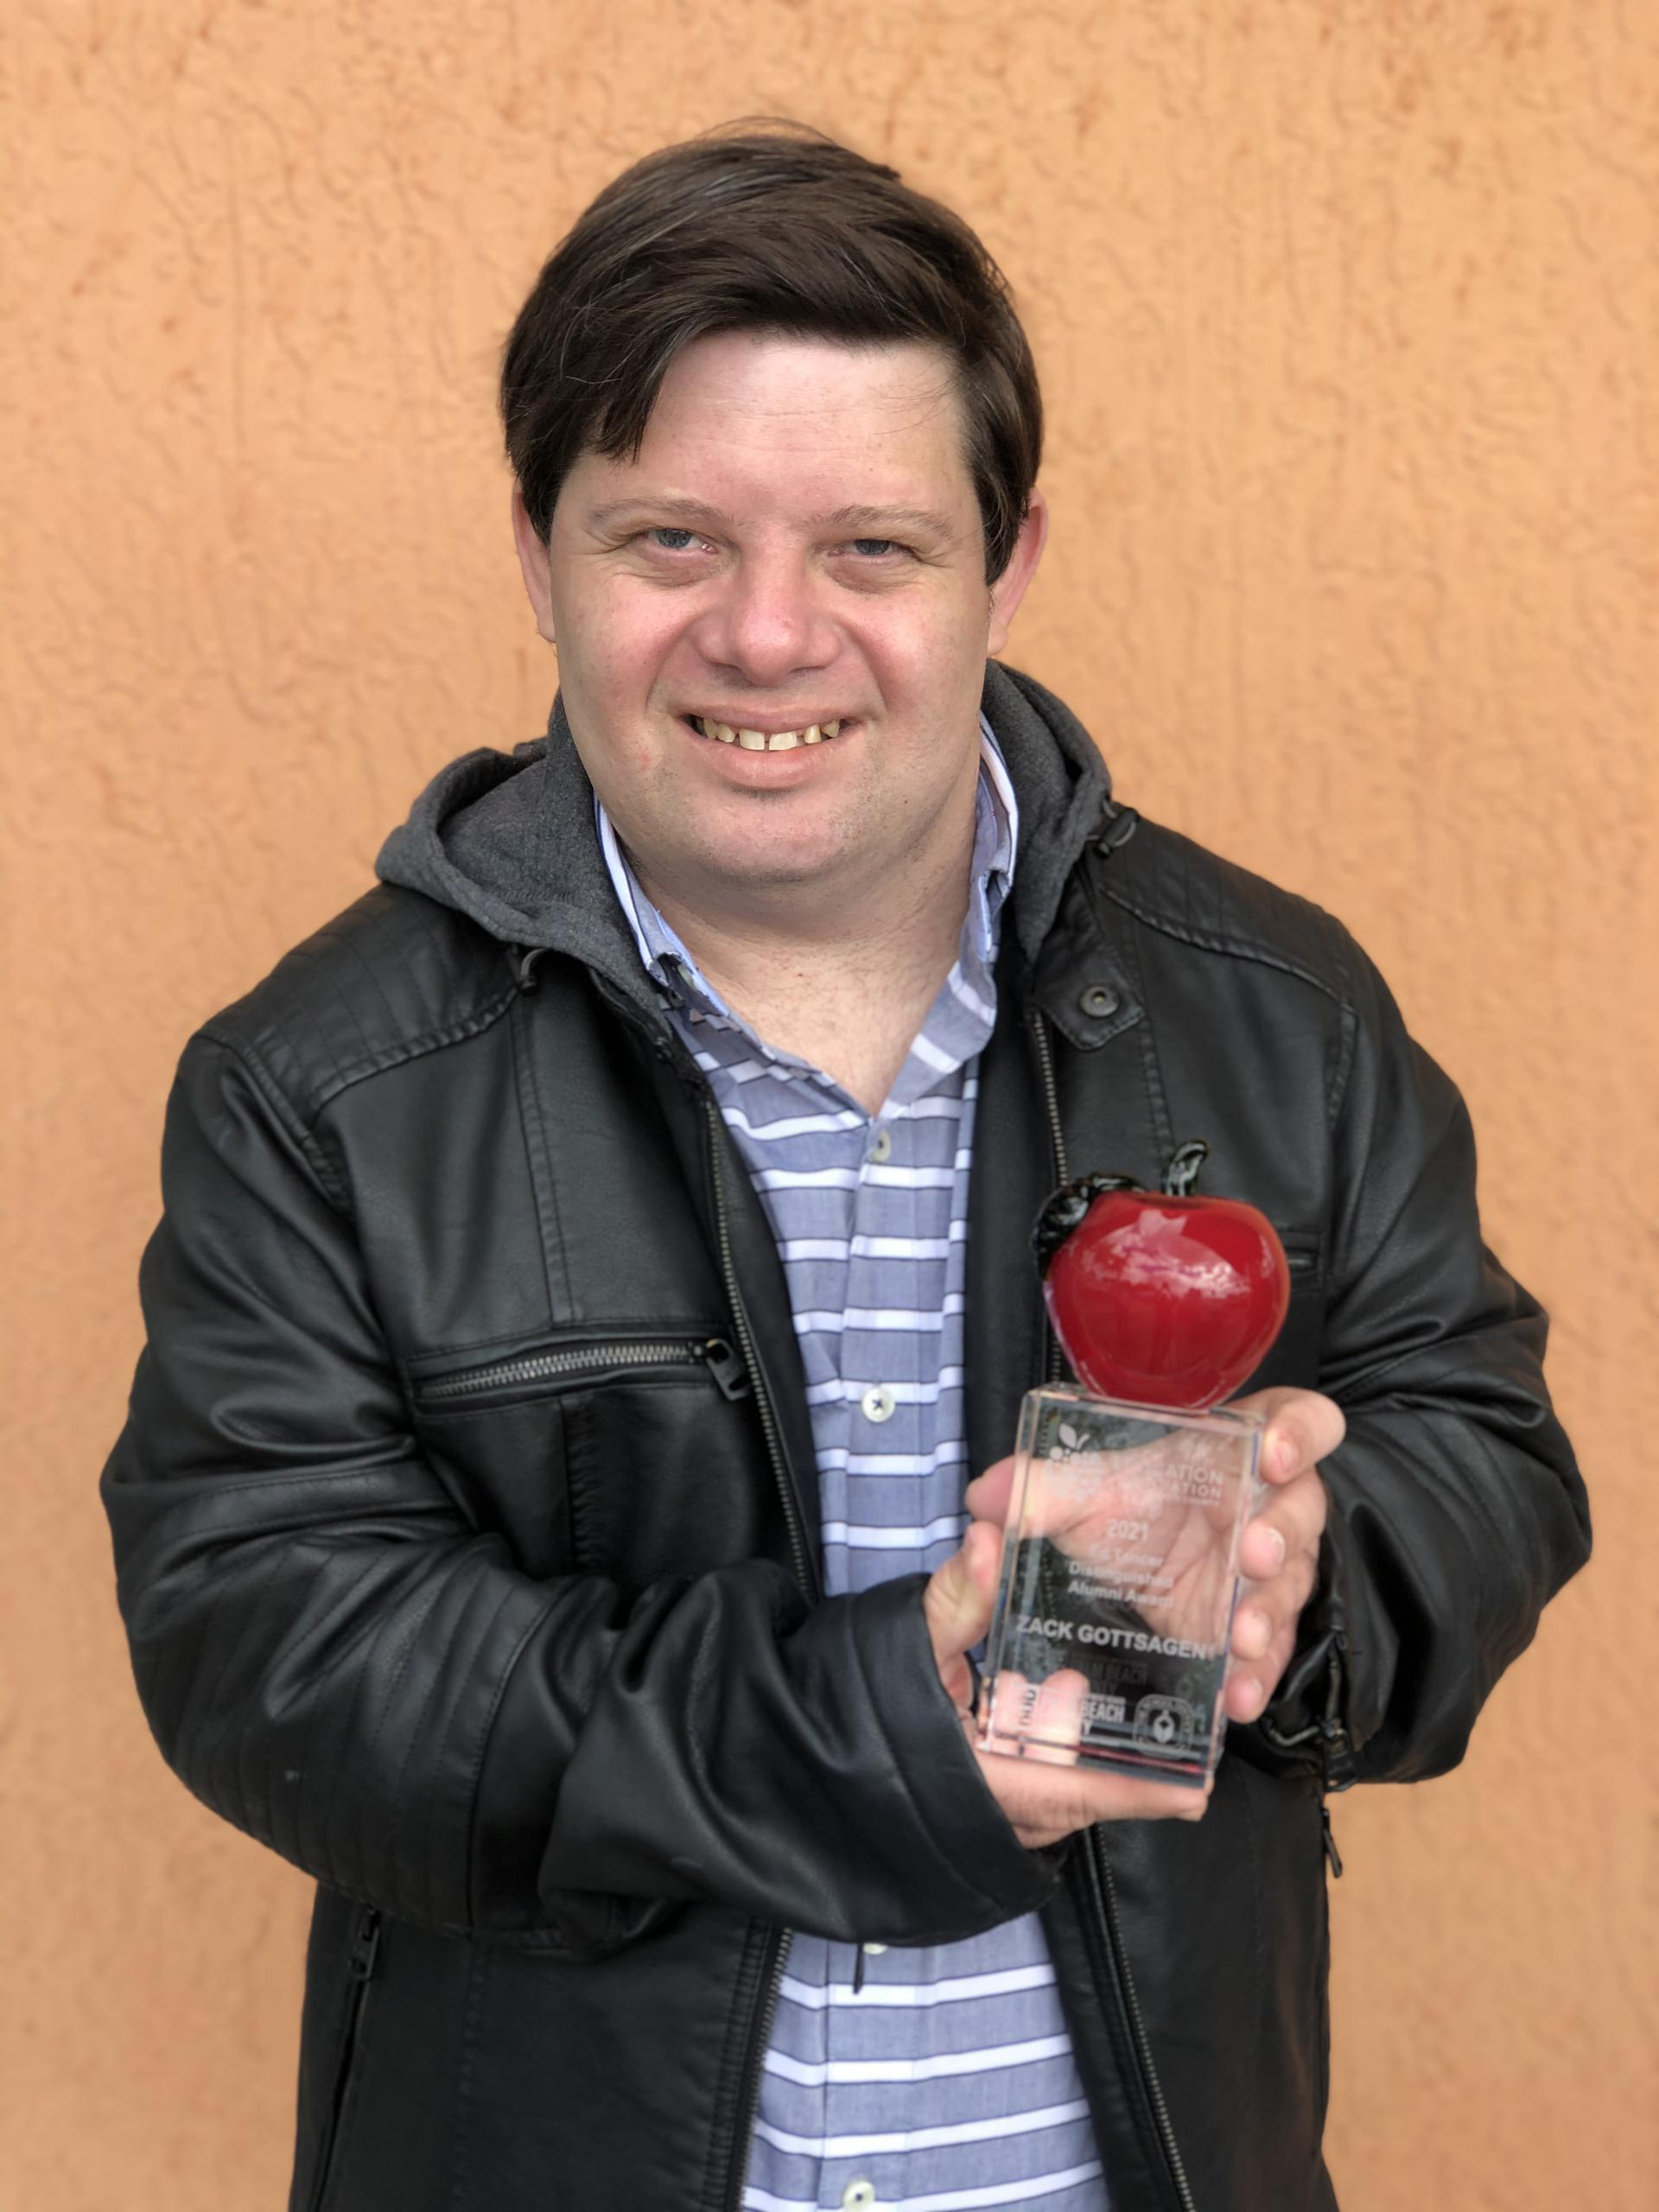 Zack Gottsagen with Alumni Award